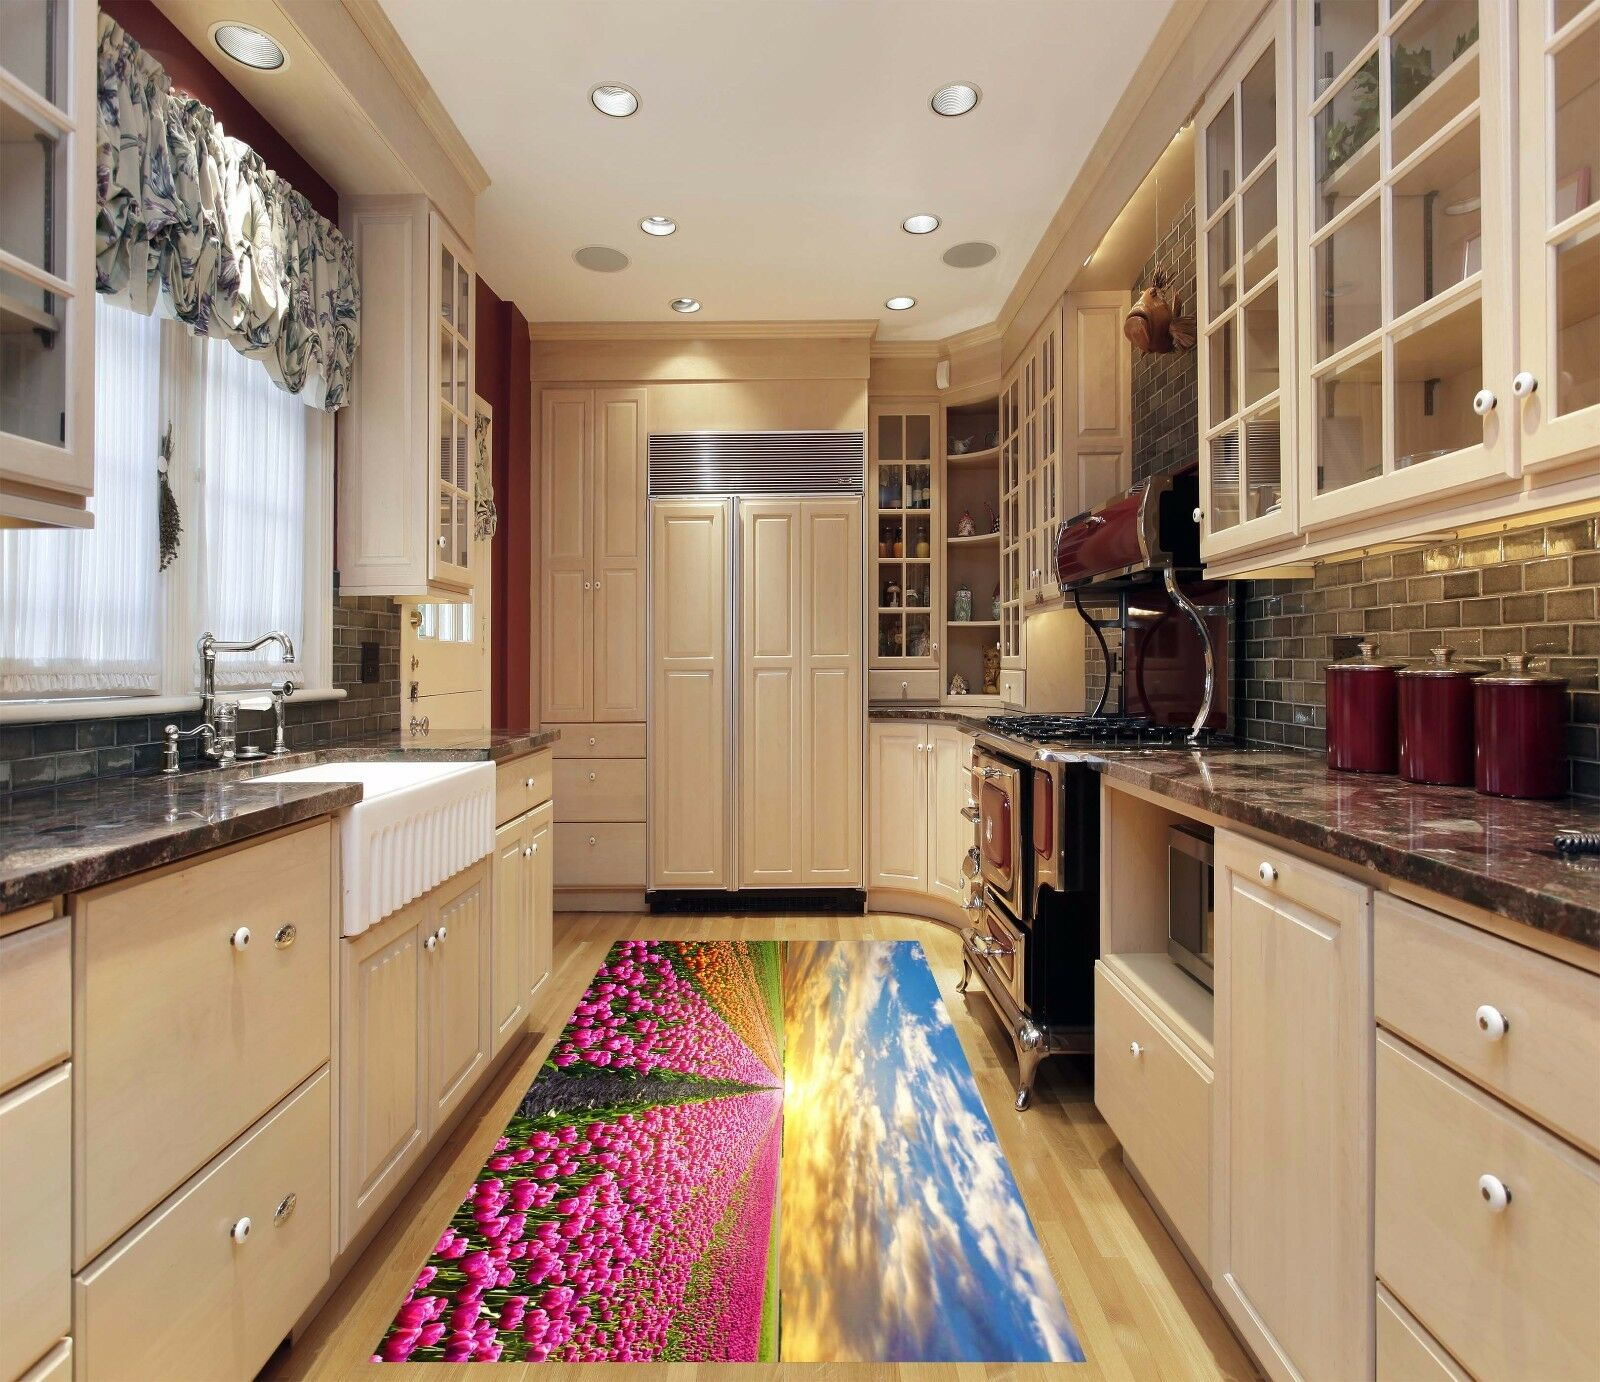 3D Tulip Cloud 87 Kitchen Mat Floor Murals Wall Print Wall AJ WALLPAPER AU Carly